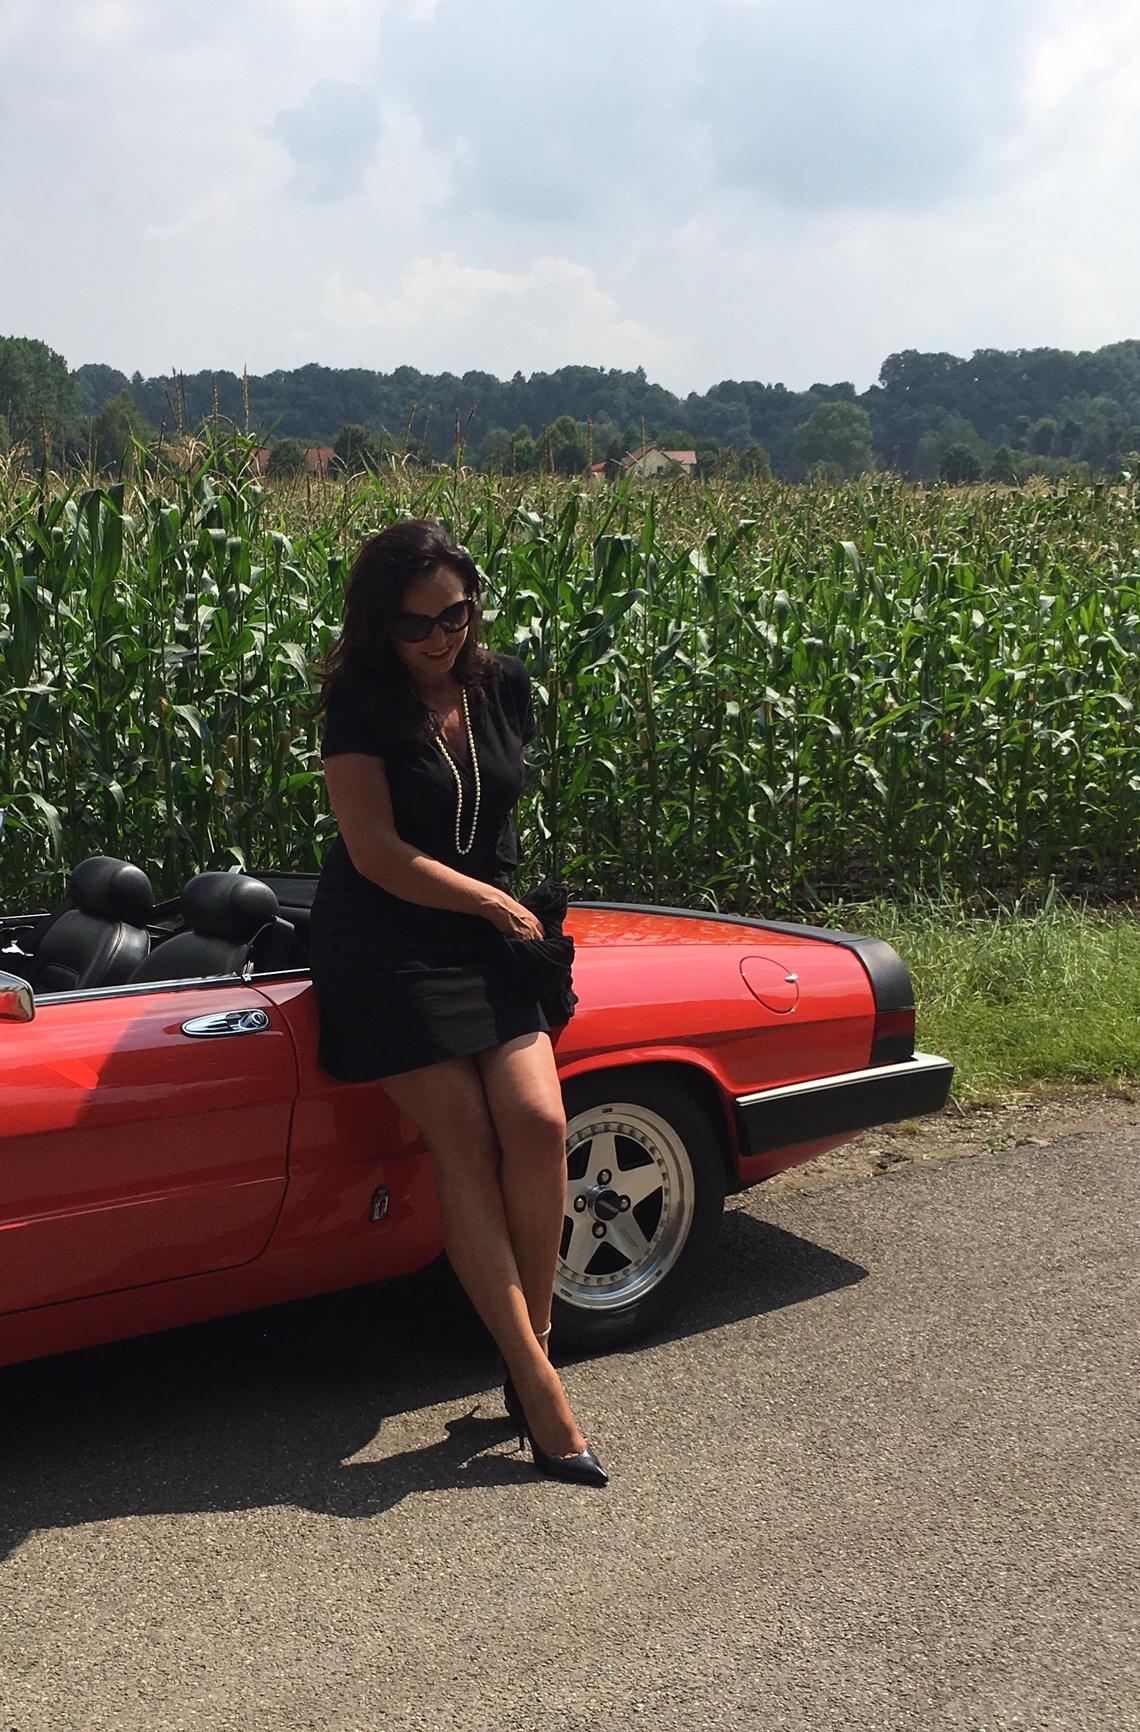 Prada dress, prada sunglasses, eyewear, style, woman, car, alpha romeo, cabrio, pearls, red,